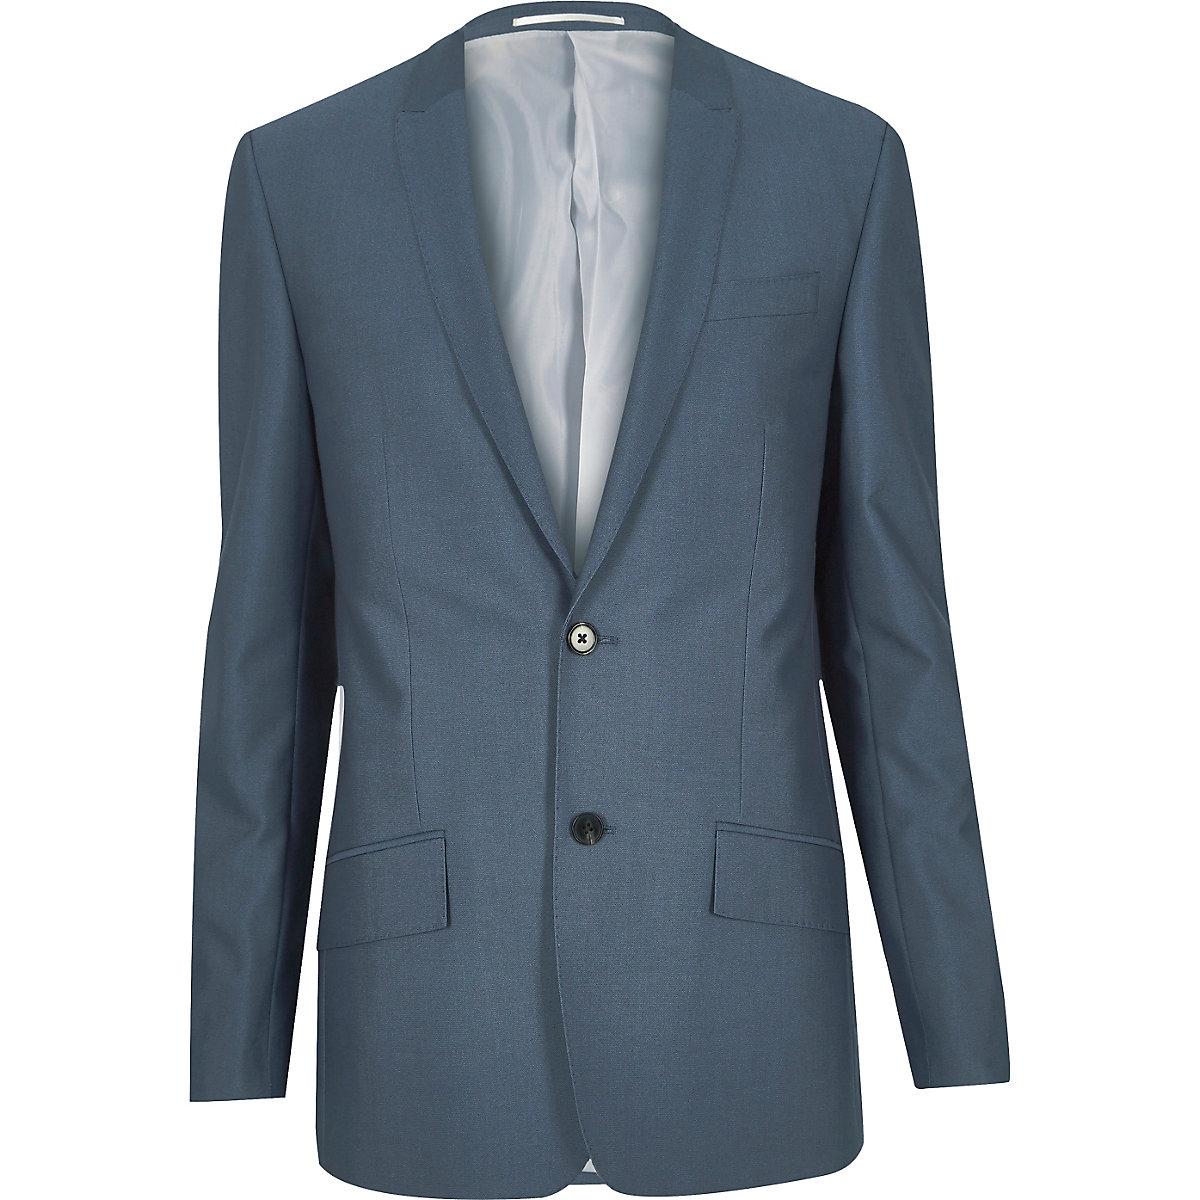 Blue tailored suit jacket